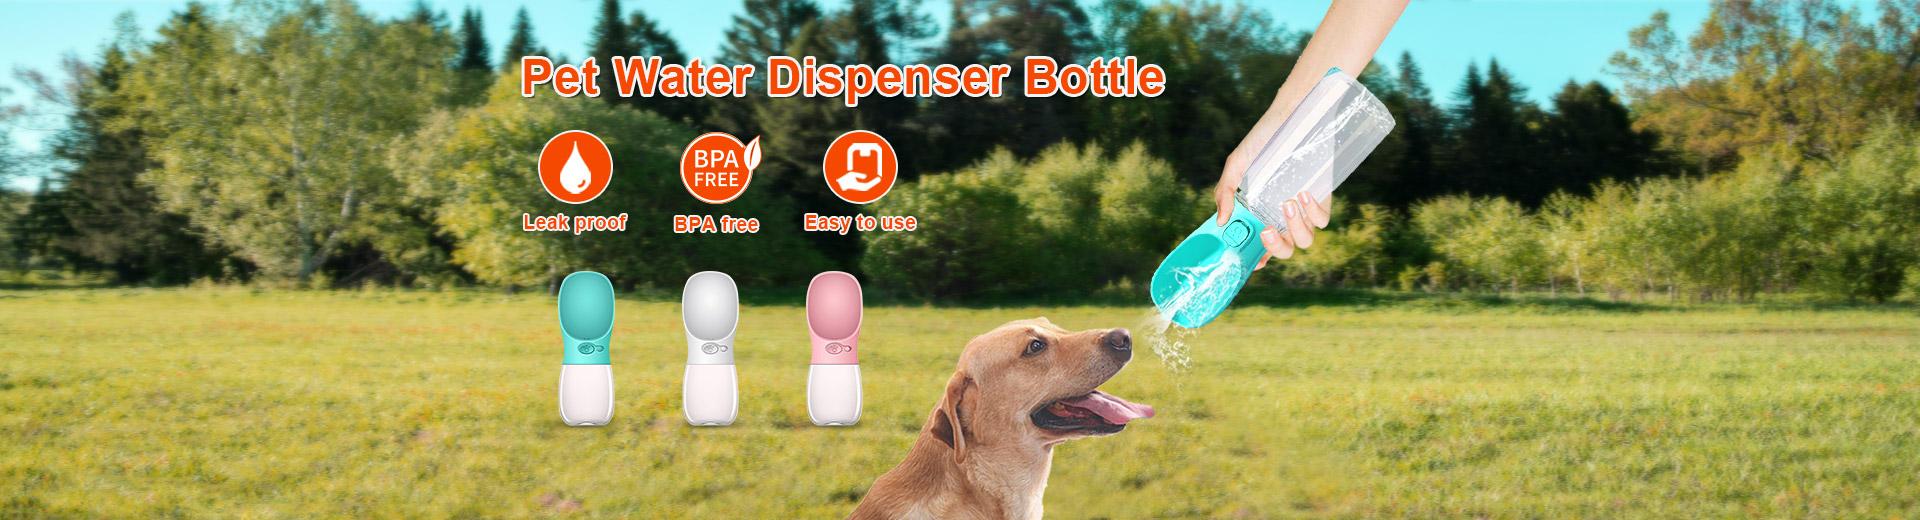 Pet-Water-Dispenser-Bottle